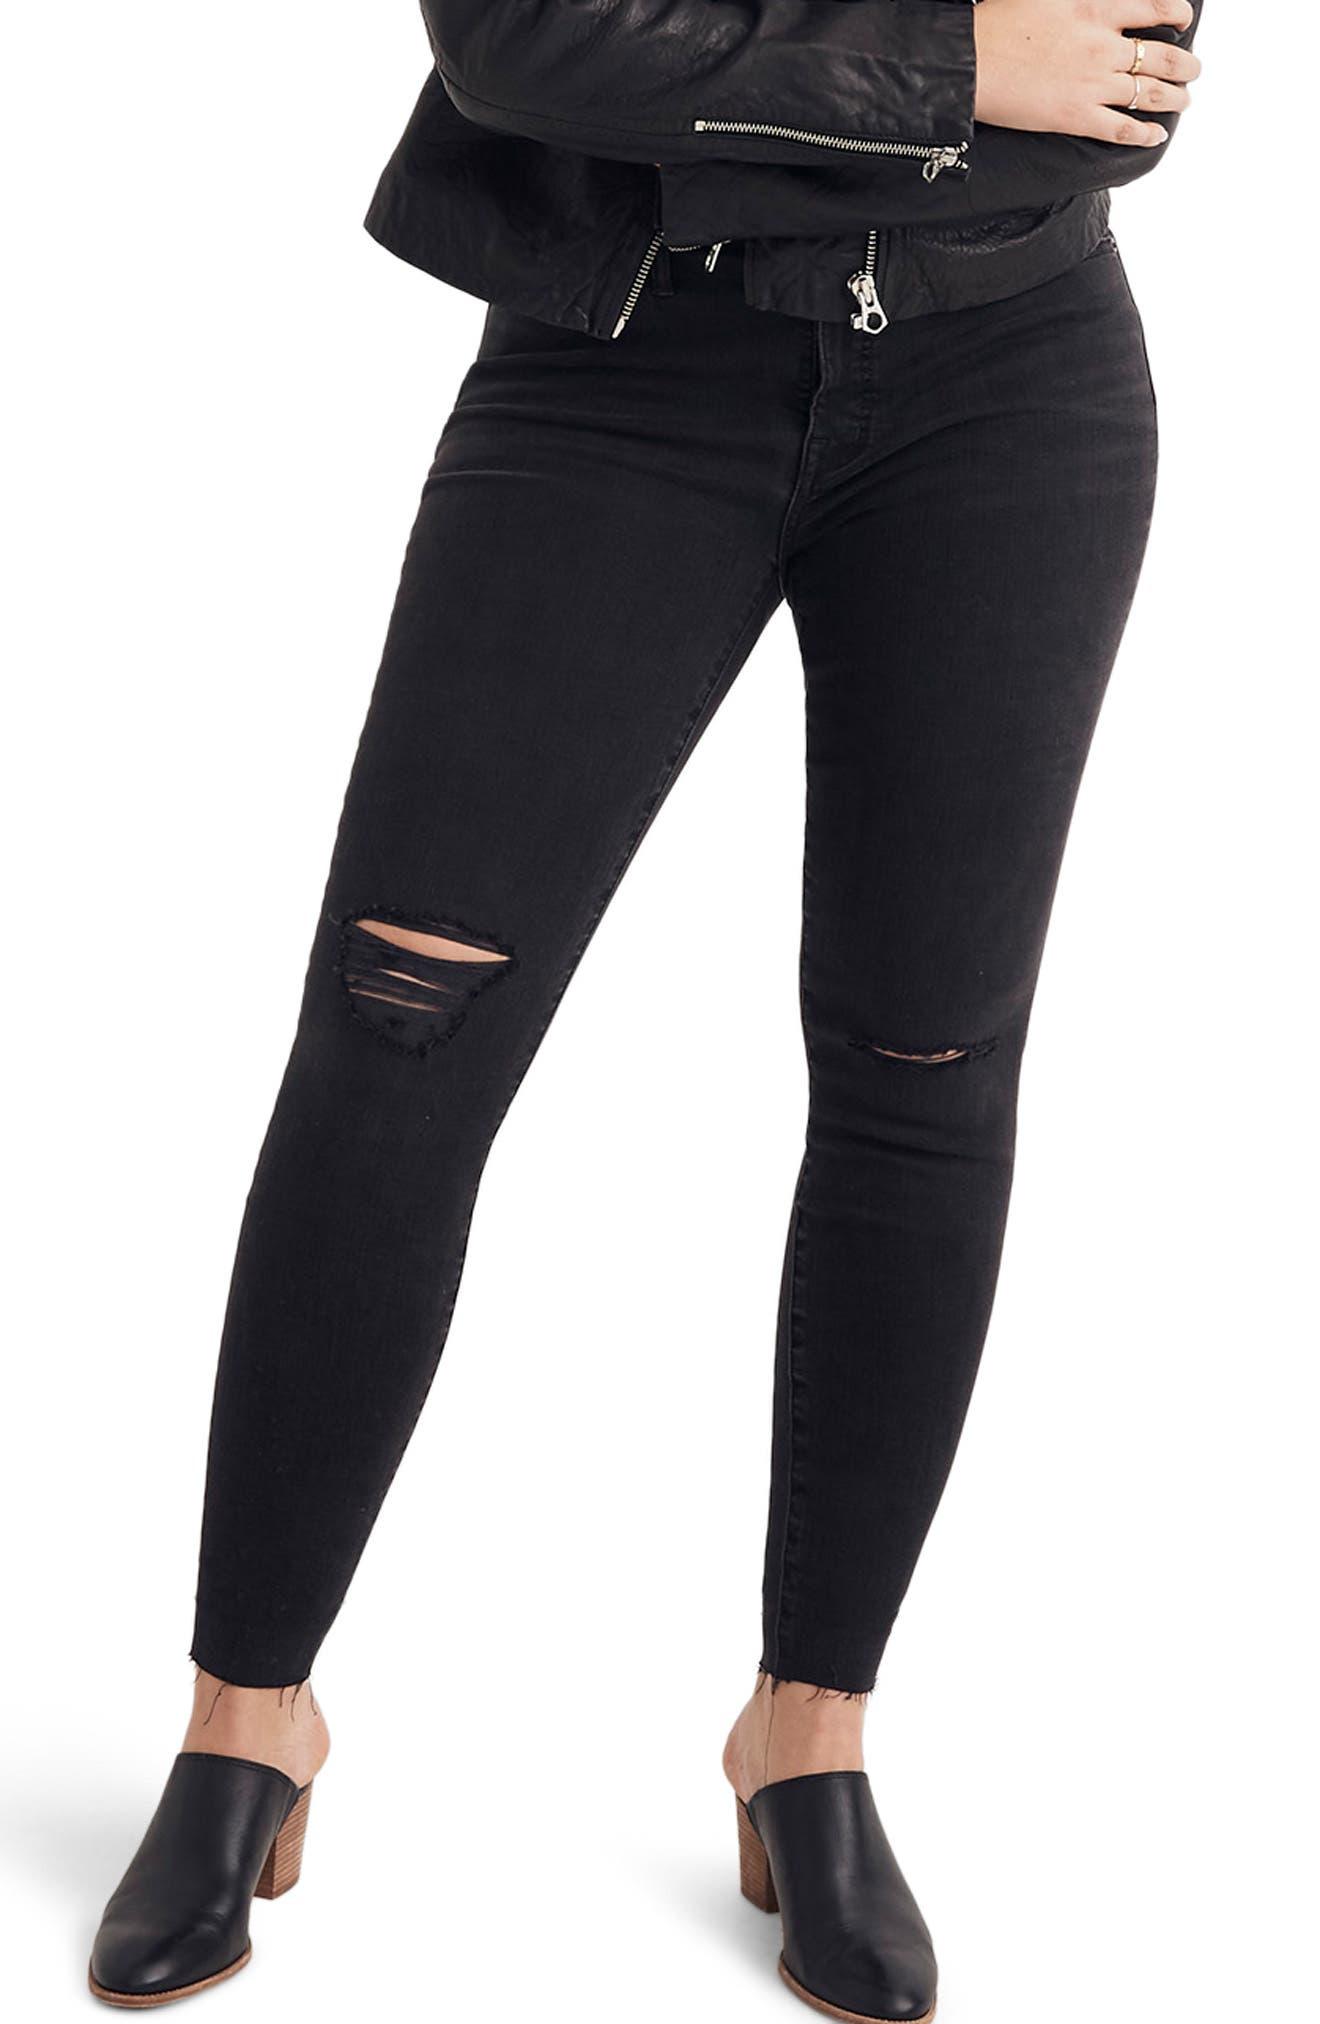 9-Inch High Waist Skinny Jeans,                             Alternate thumbnail 2, color,                             BLACK SEA